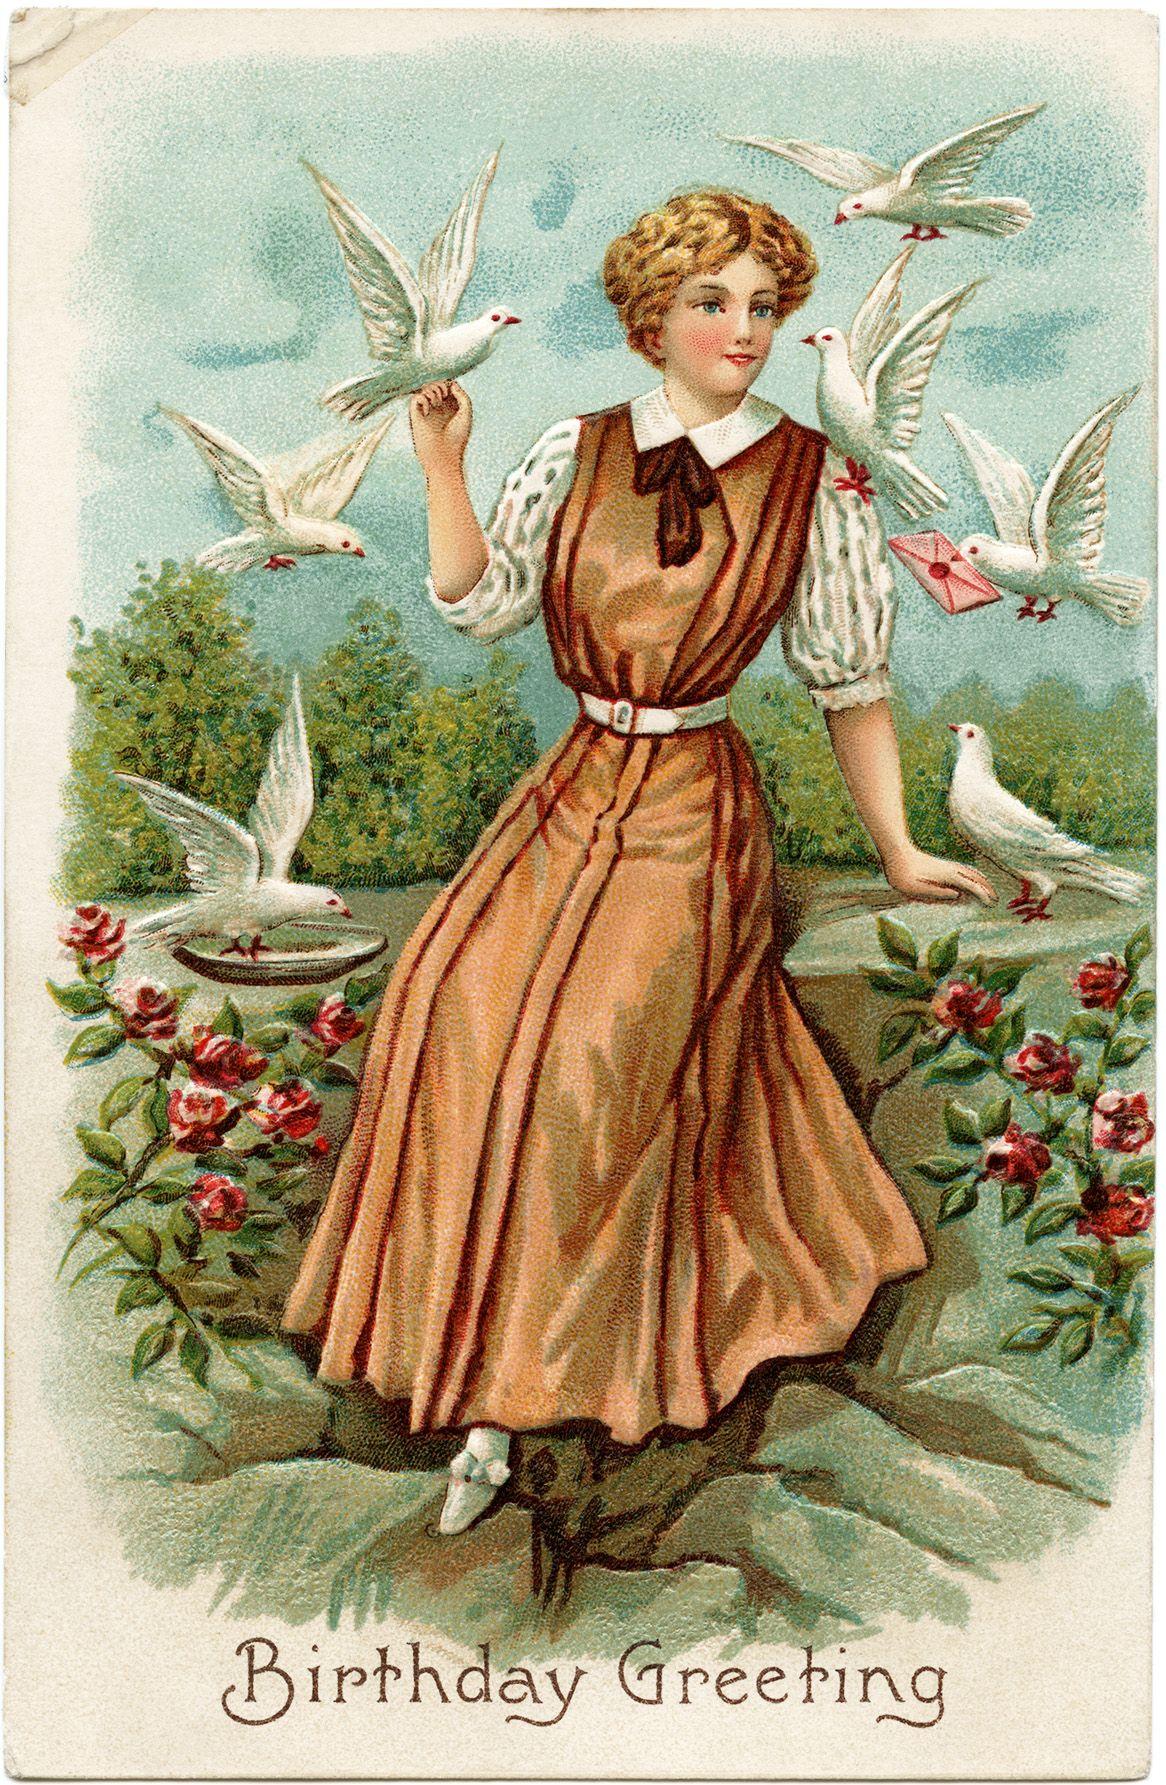 Lady and Birds Vintage Birthday Greetings Postcard